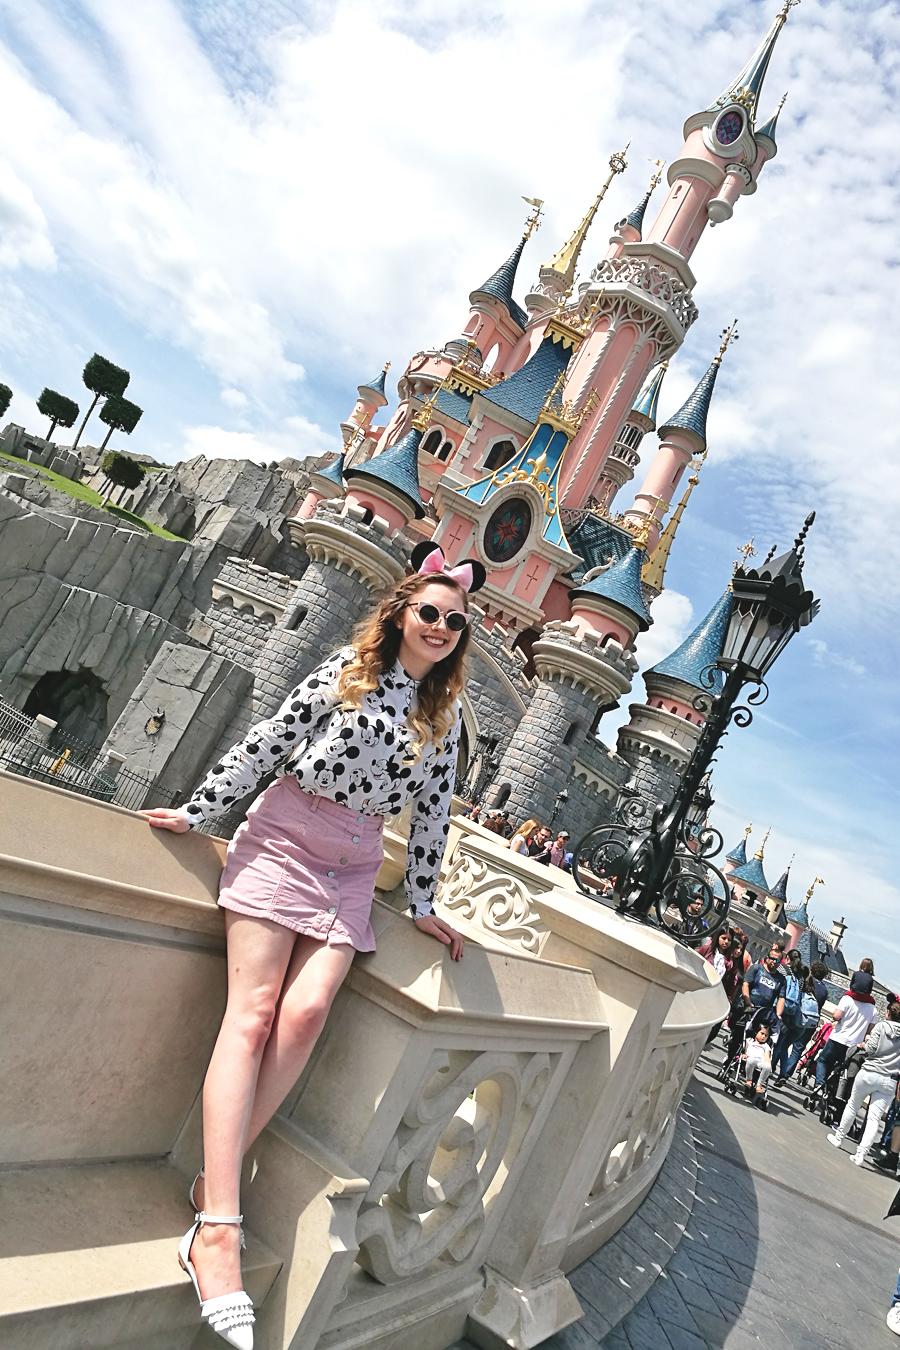 Disneyland Outfits & Packing - Siren & Rose